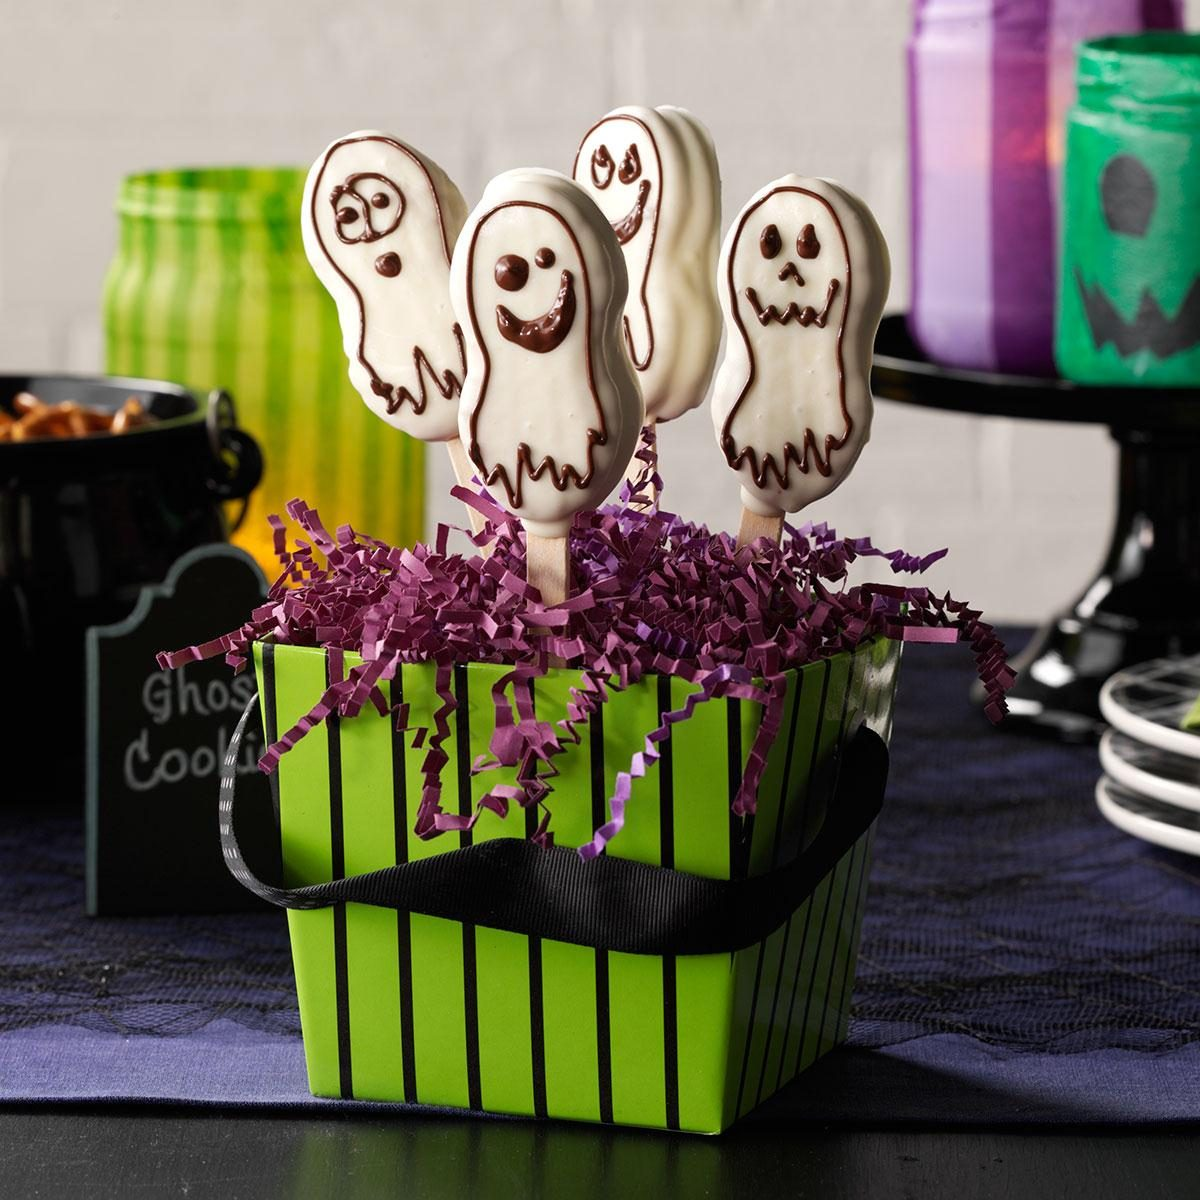 Top 10 Halloween Recipes | Taste of Home